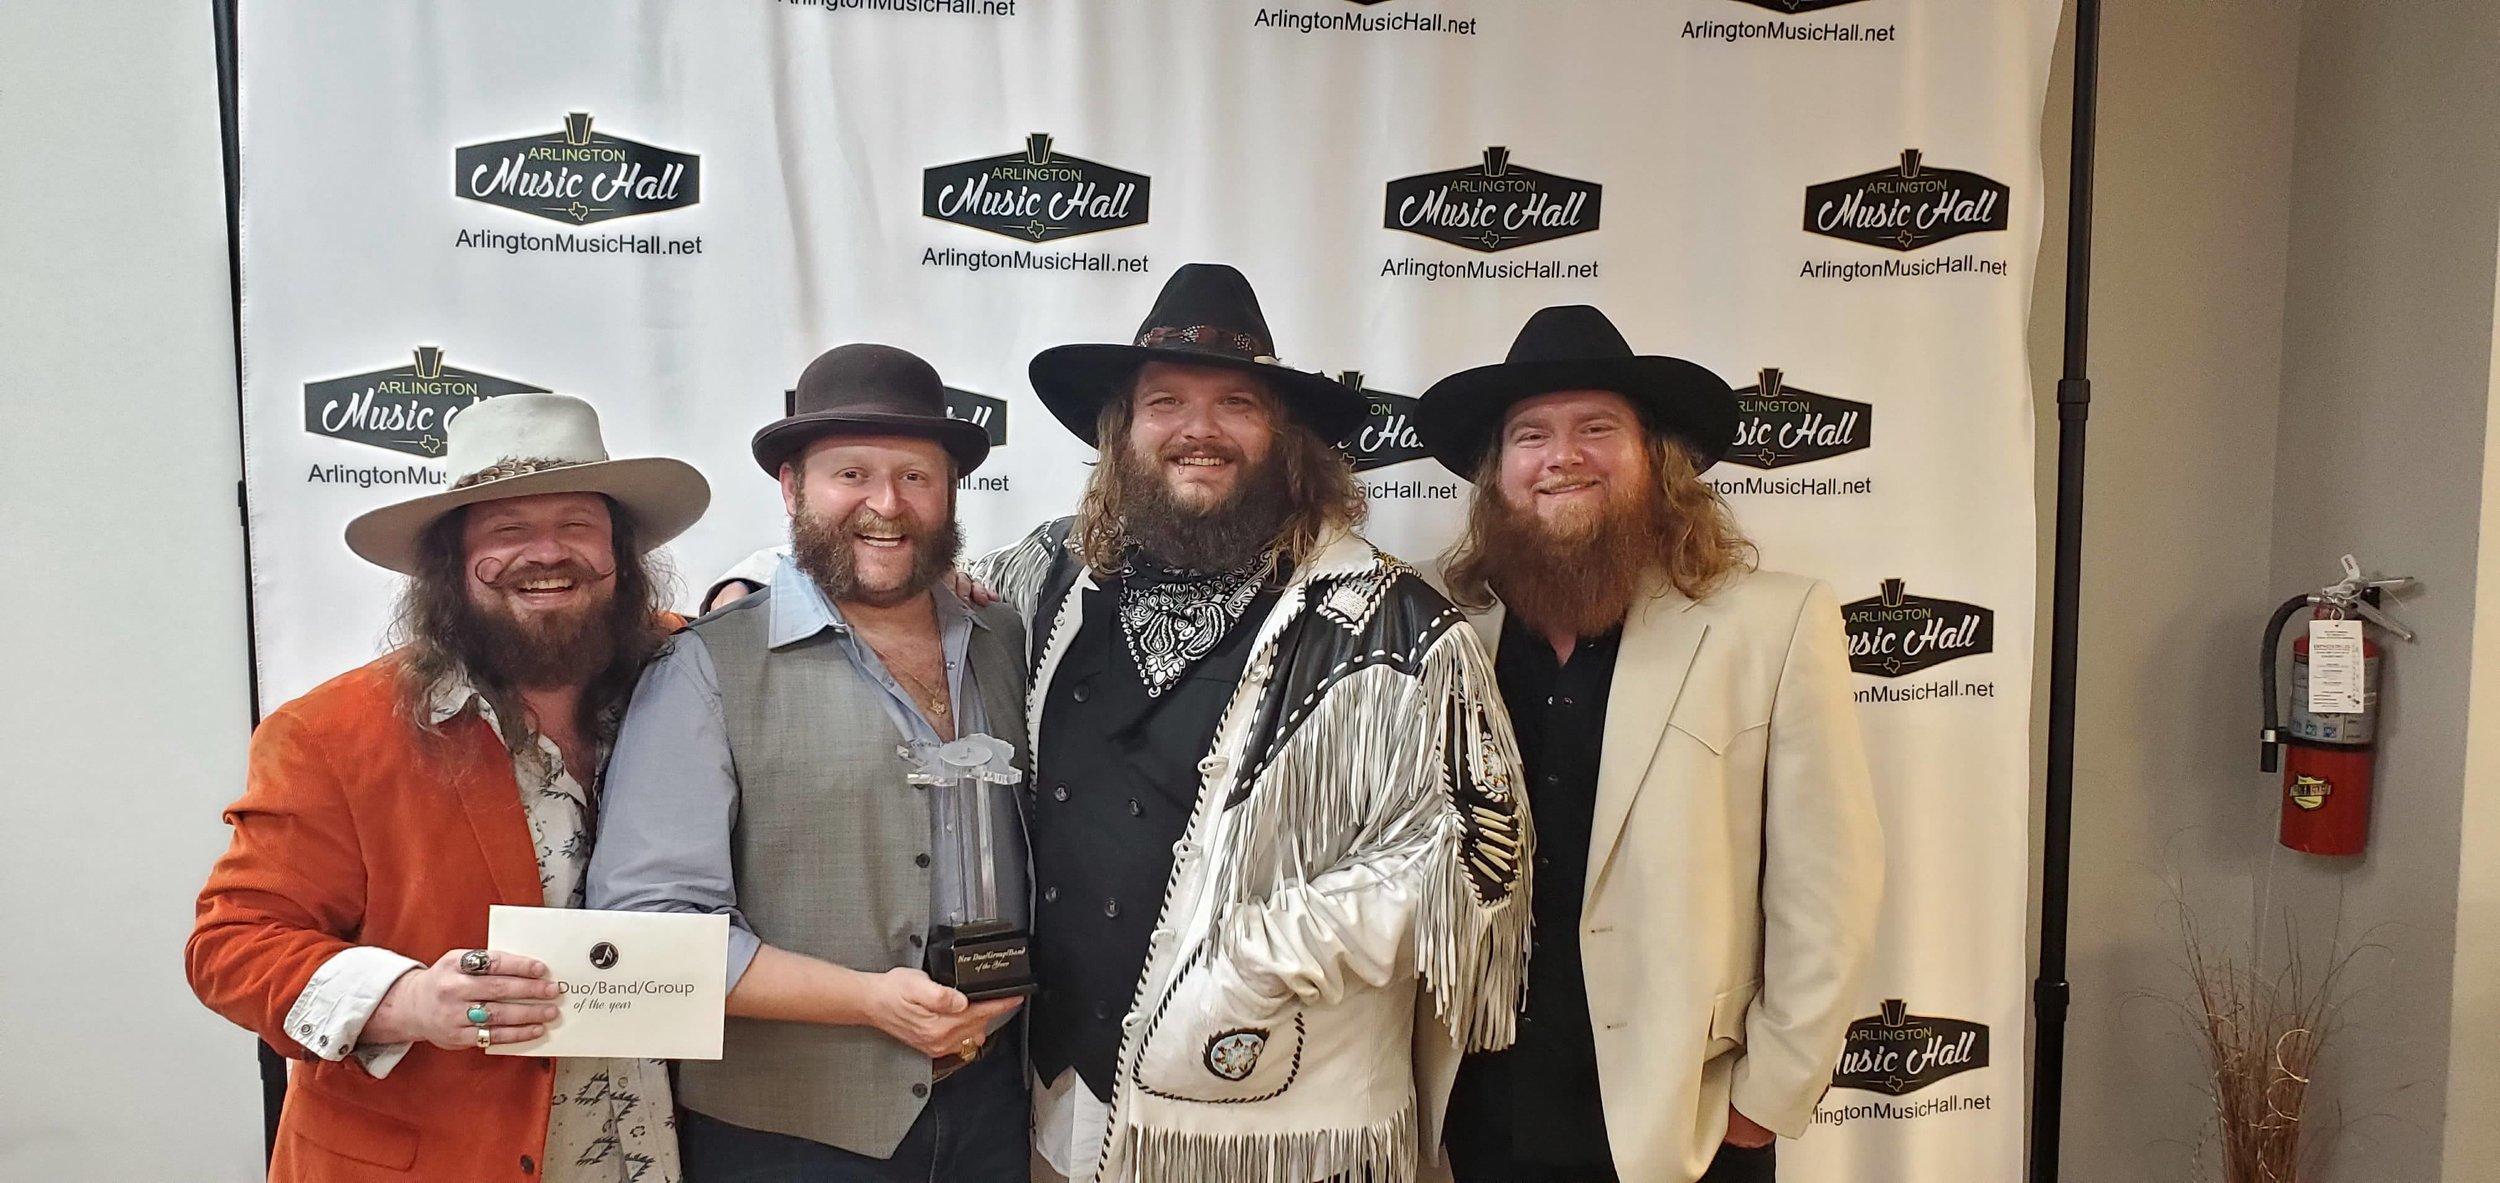 Copper Chief at the Texas Regional Radio Music Awards - Arlington, TX